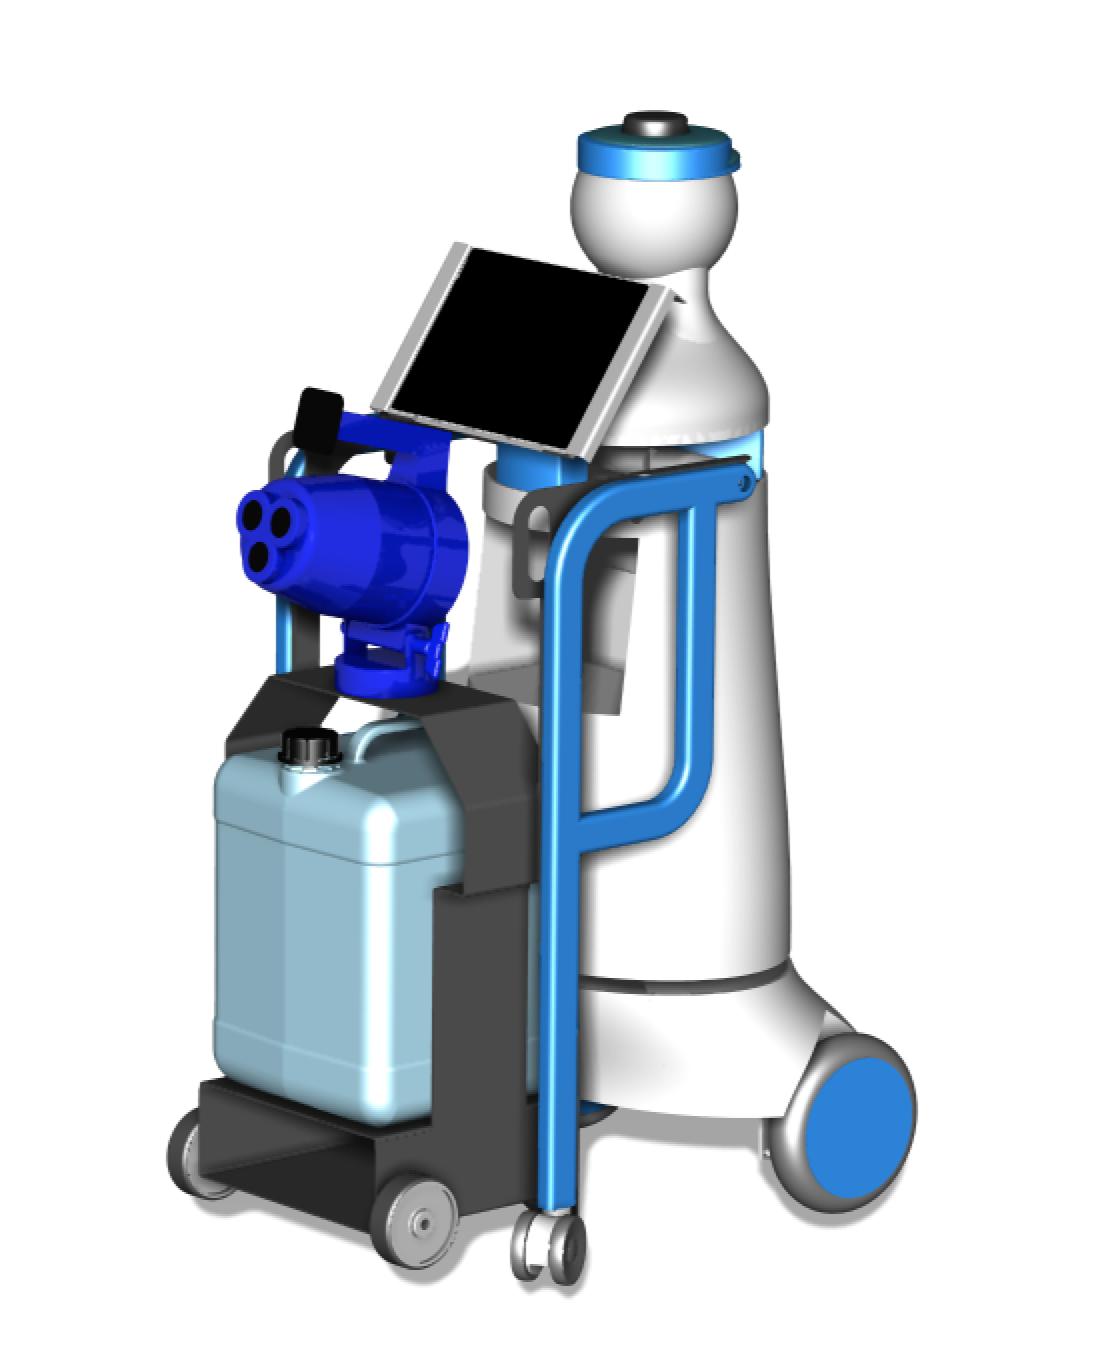 Chemical-disinfection: a chemical disinfection module added to the Kompaï robot